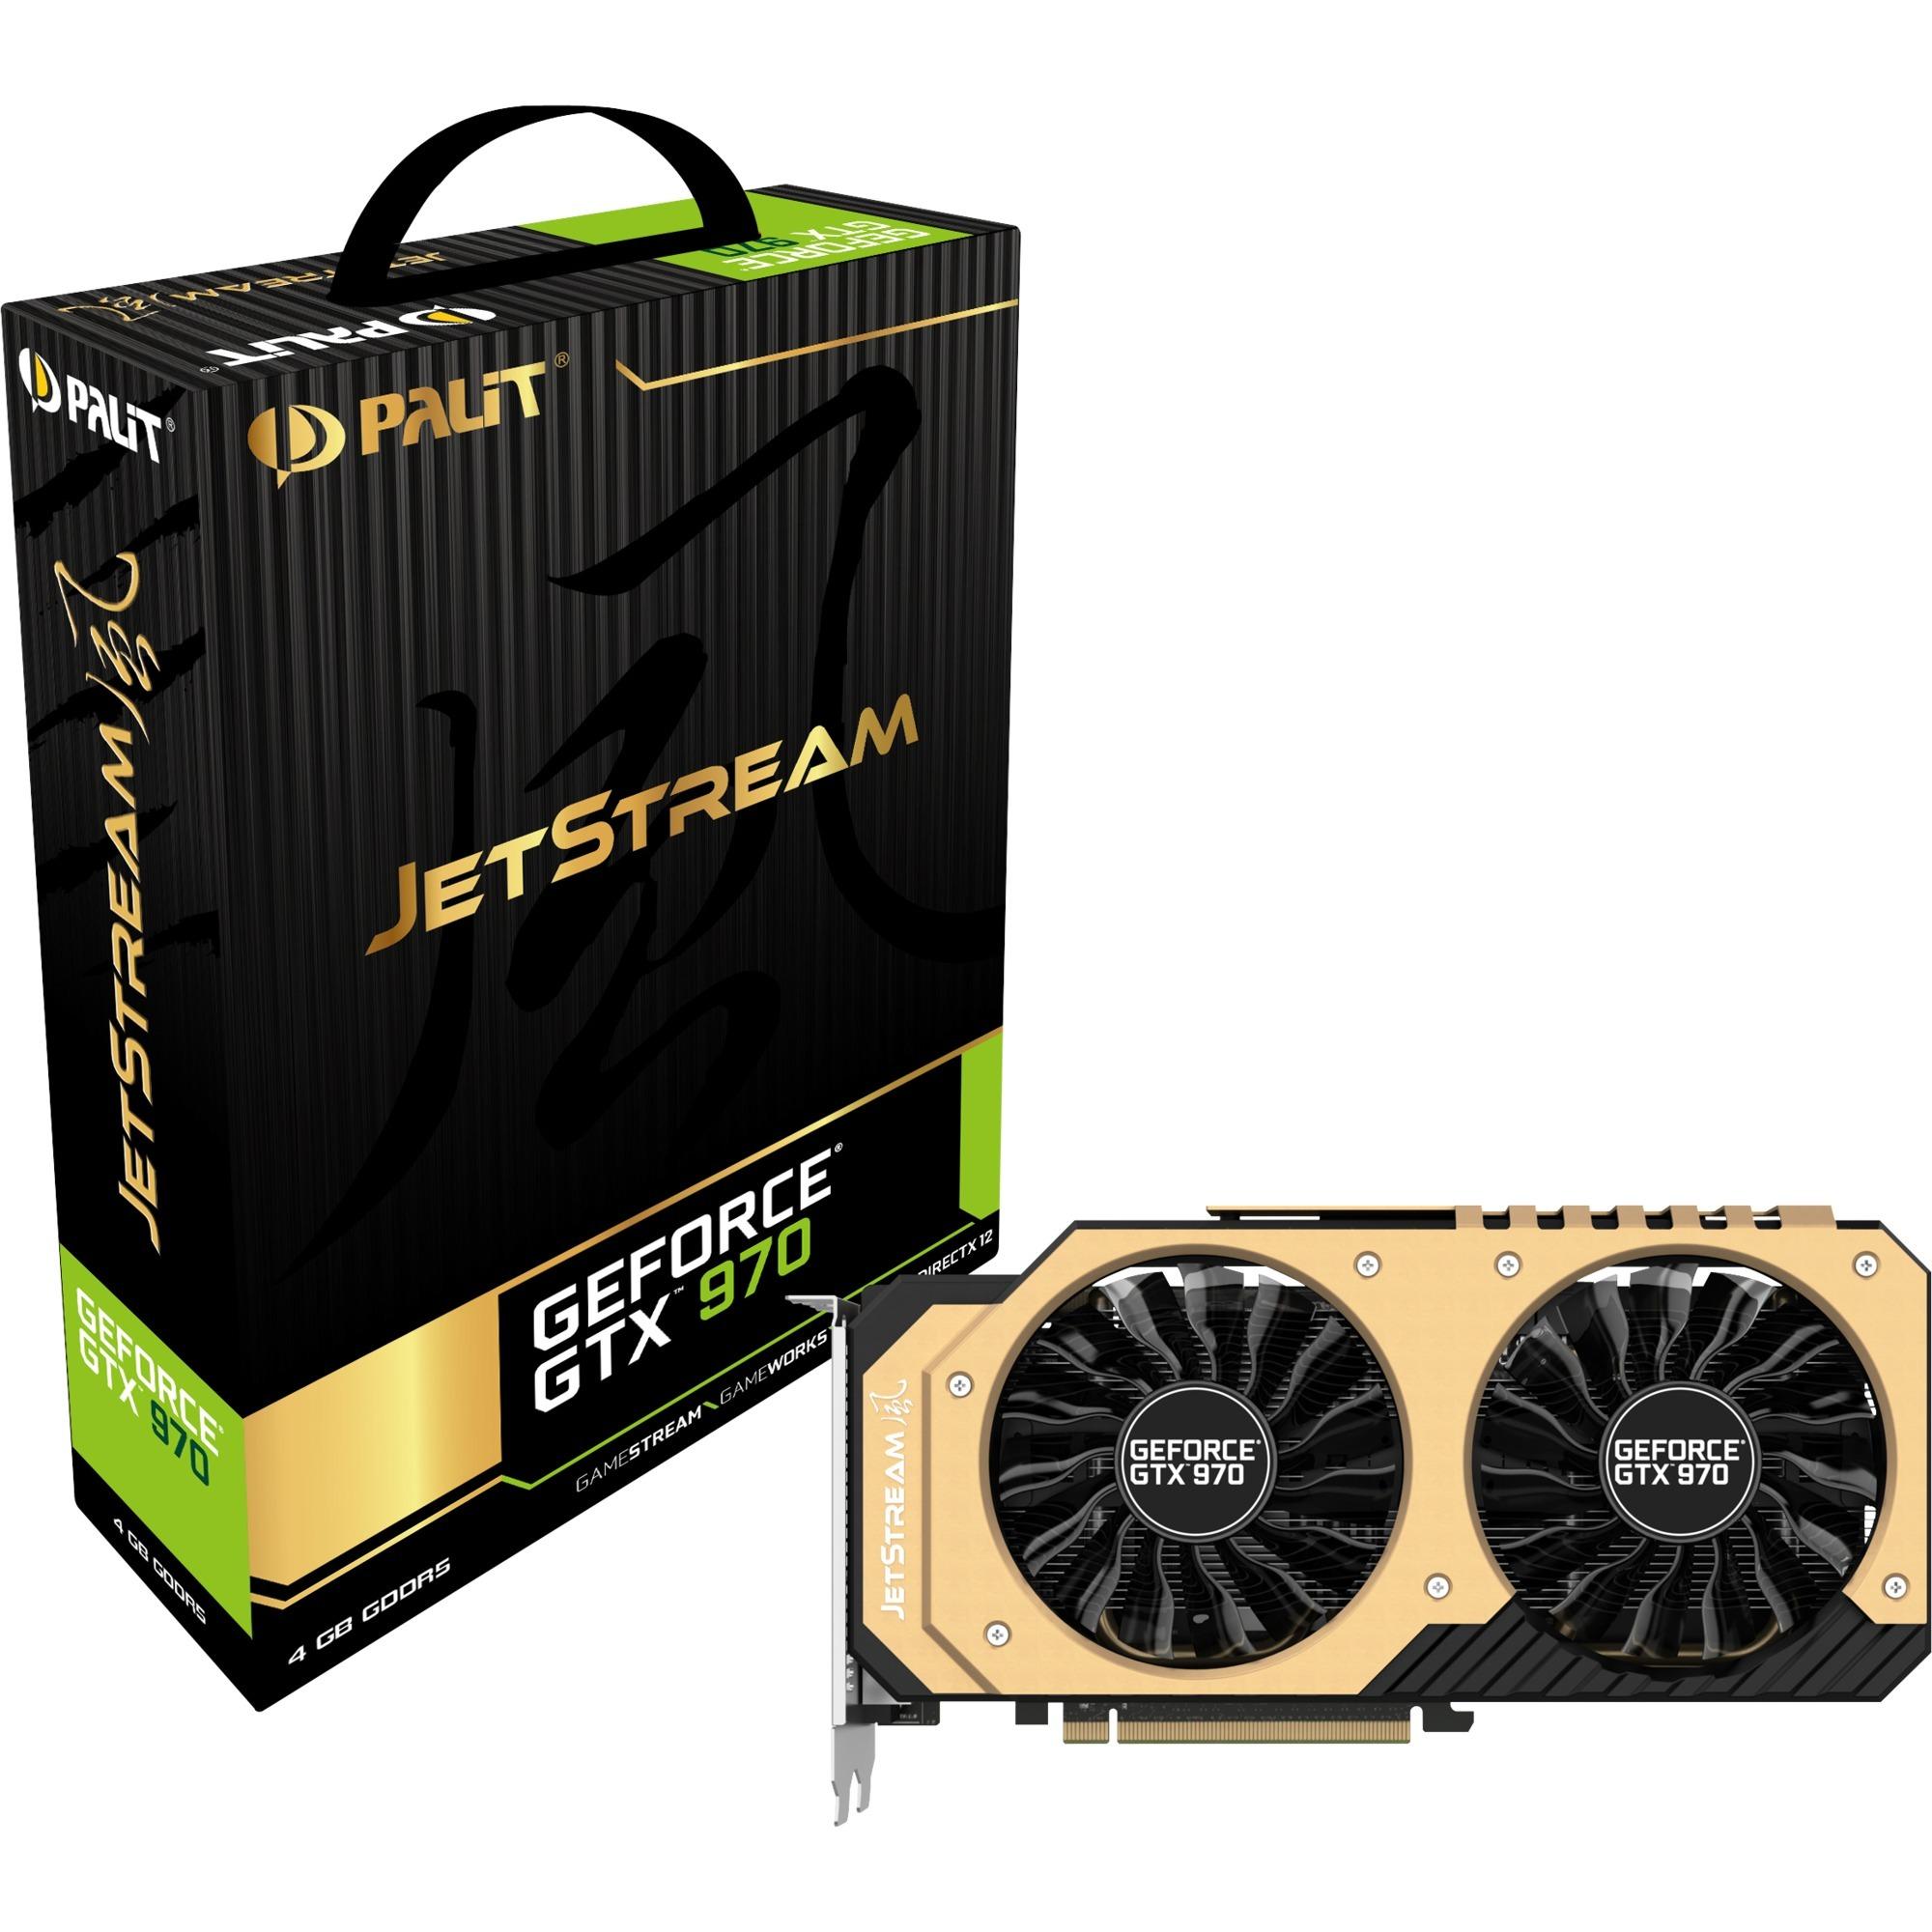 GeForce GTX970 Jetstream, Tarjeta gráfica